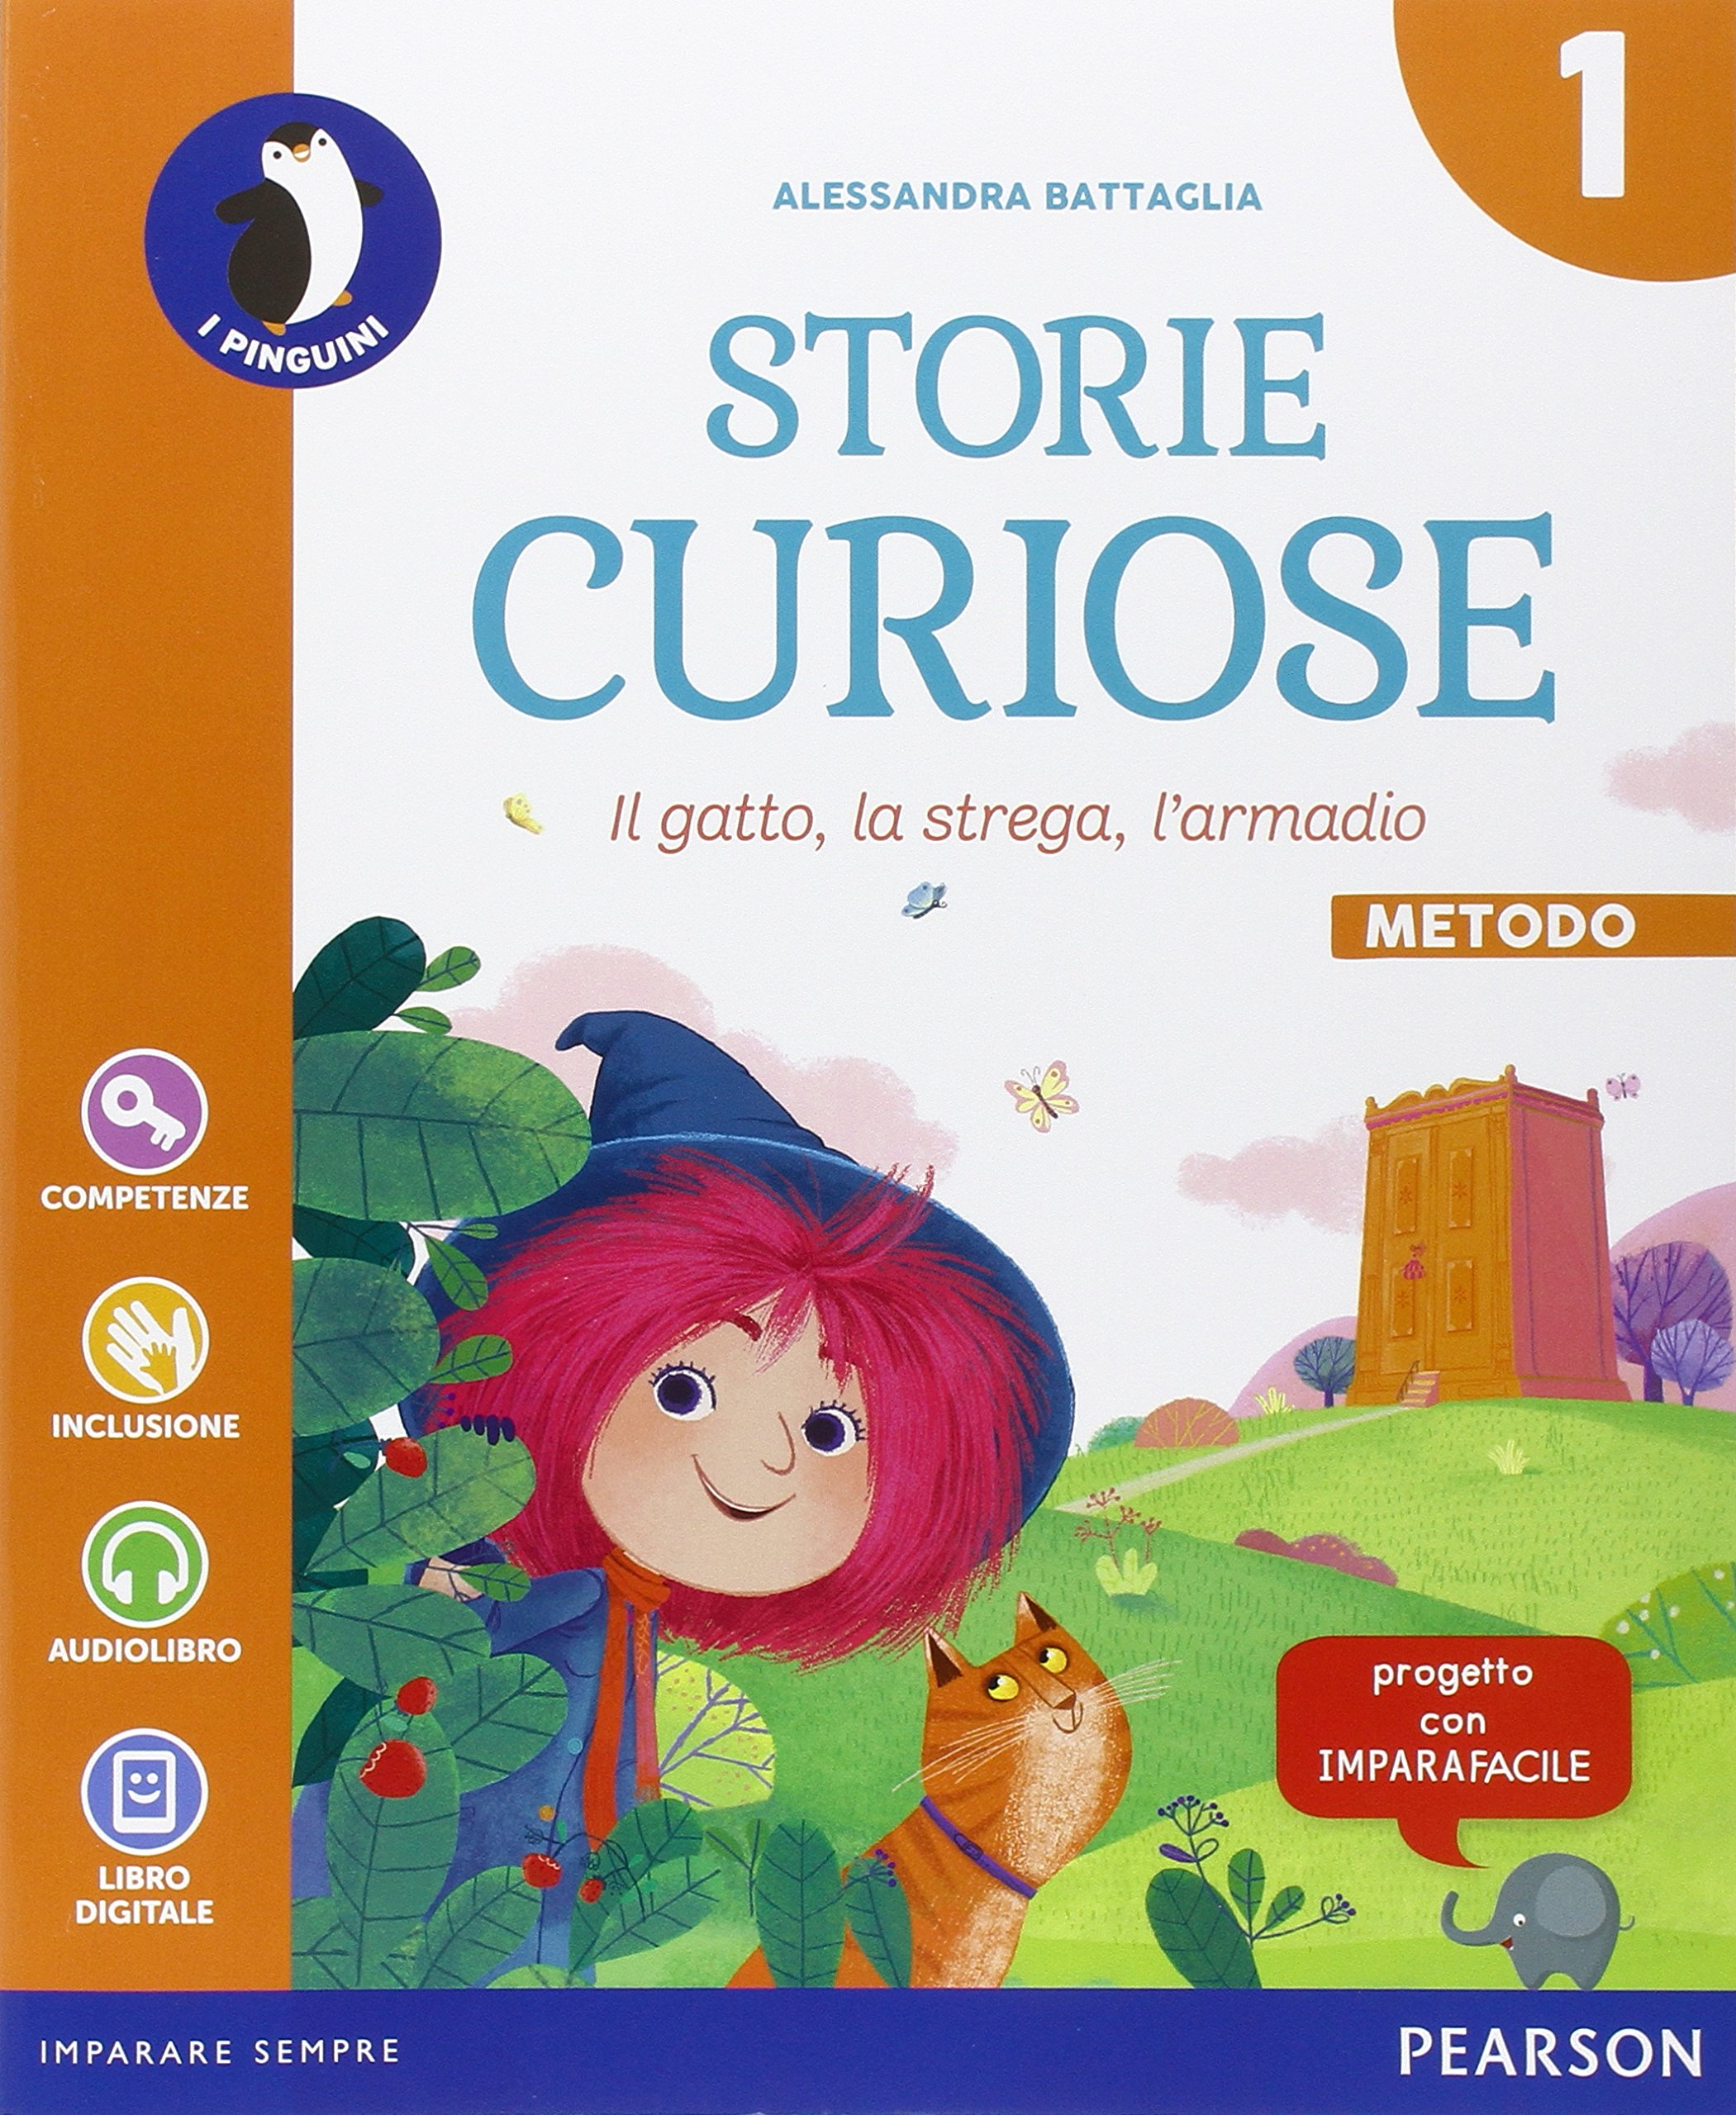 Lettura 1 elementare dj82 regardsdefemmes - Racconti biblici per bambini gratis ...